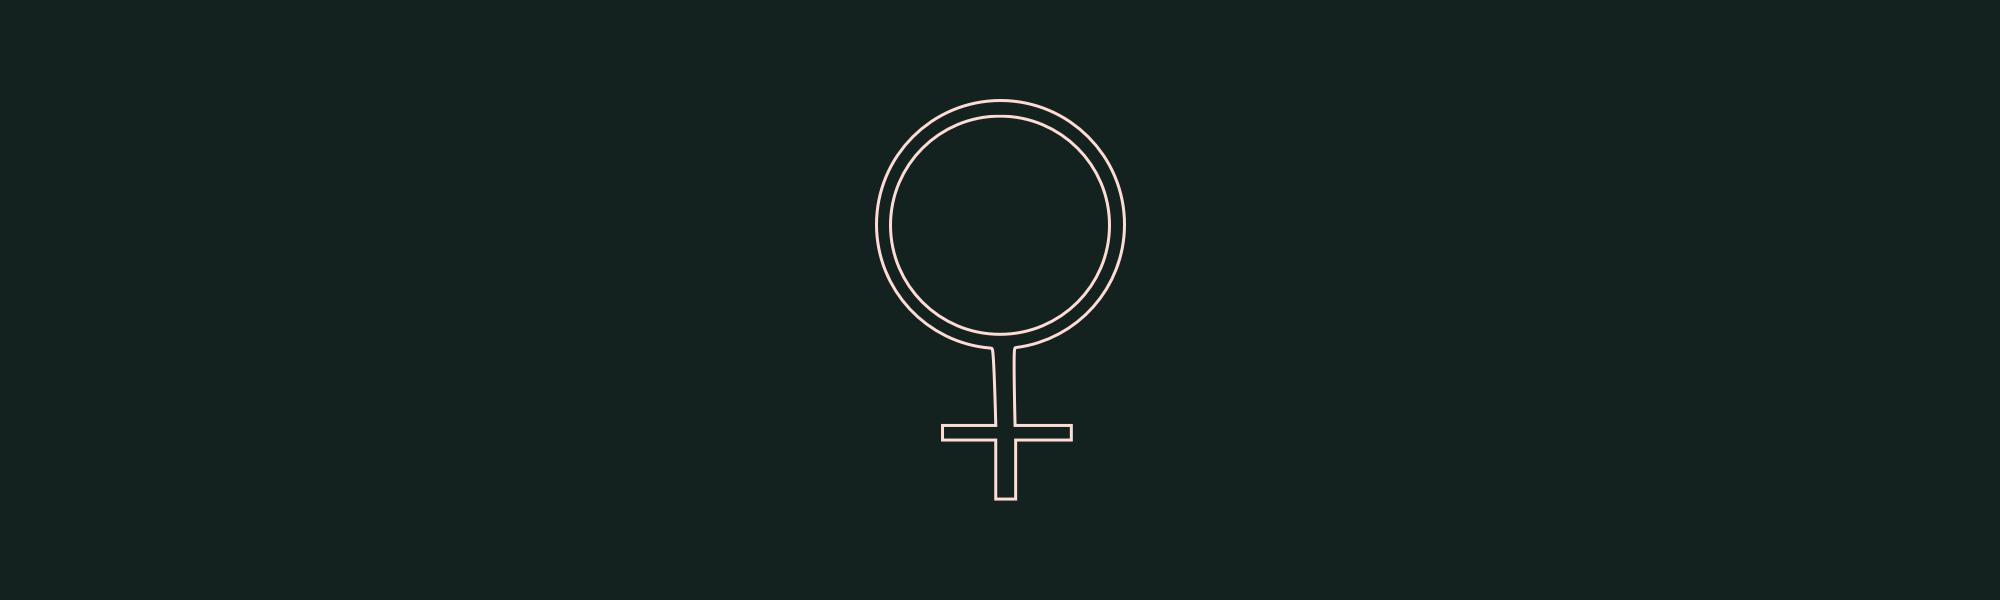 Vénus symbole du genre féminin